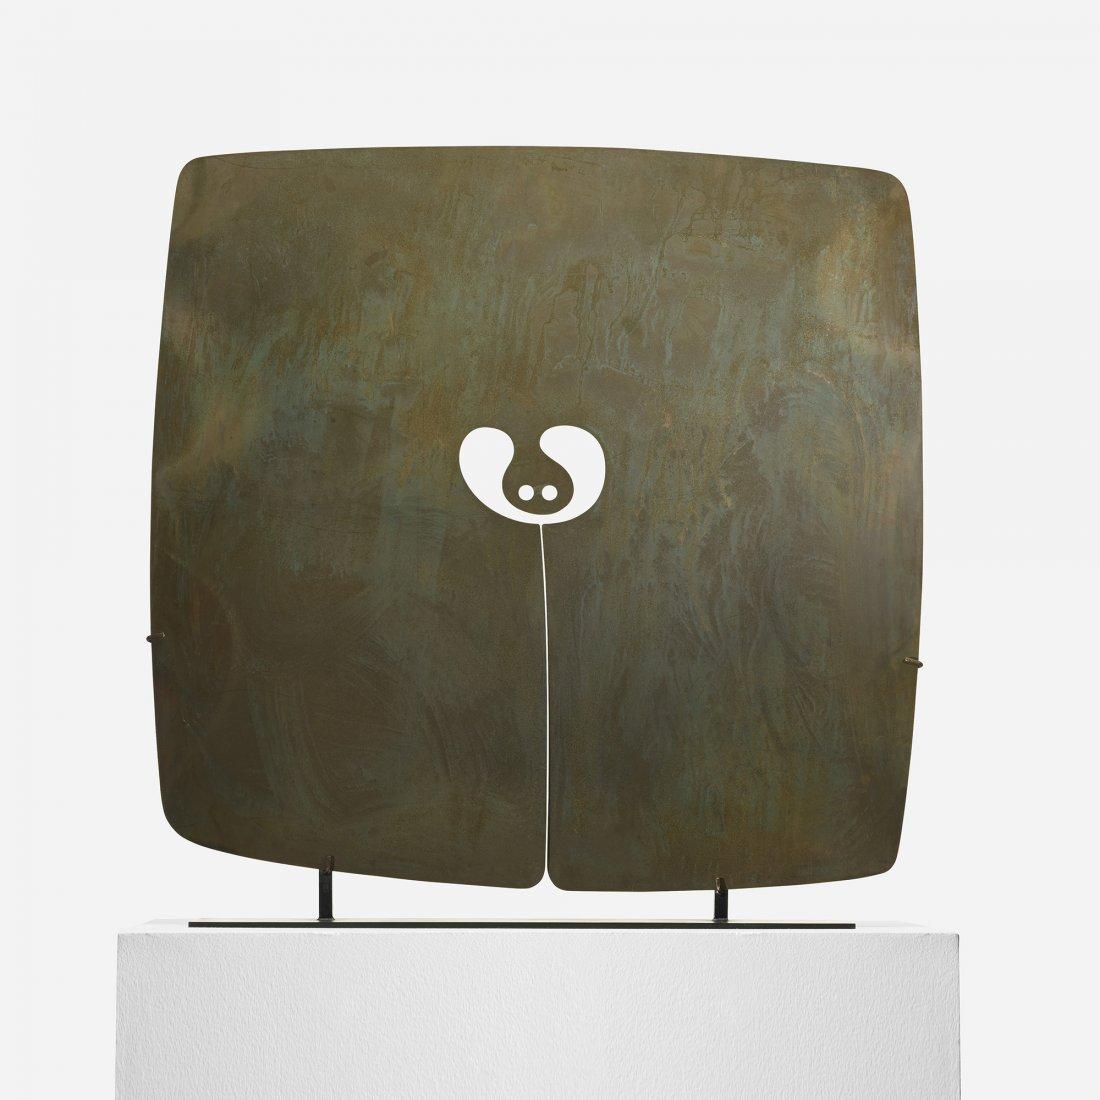 Harry Bertoia untitled (Gong)